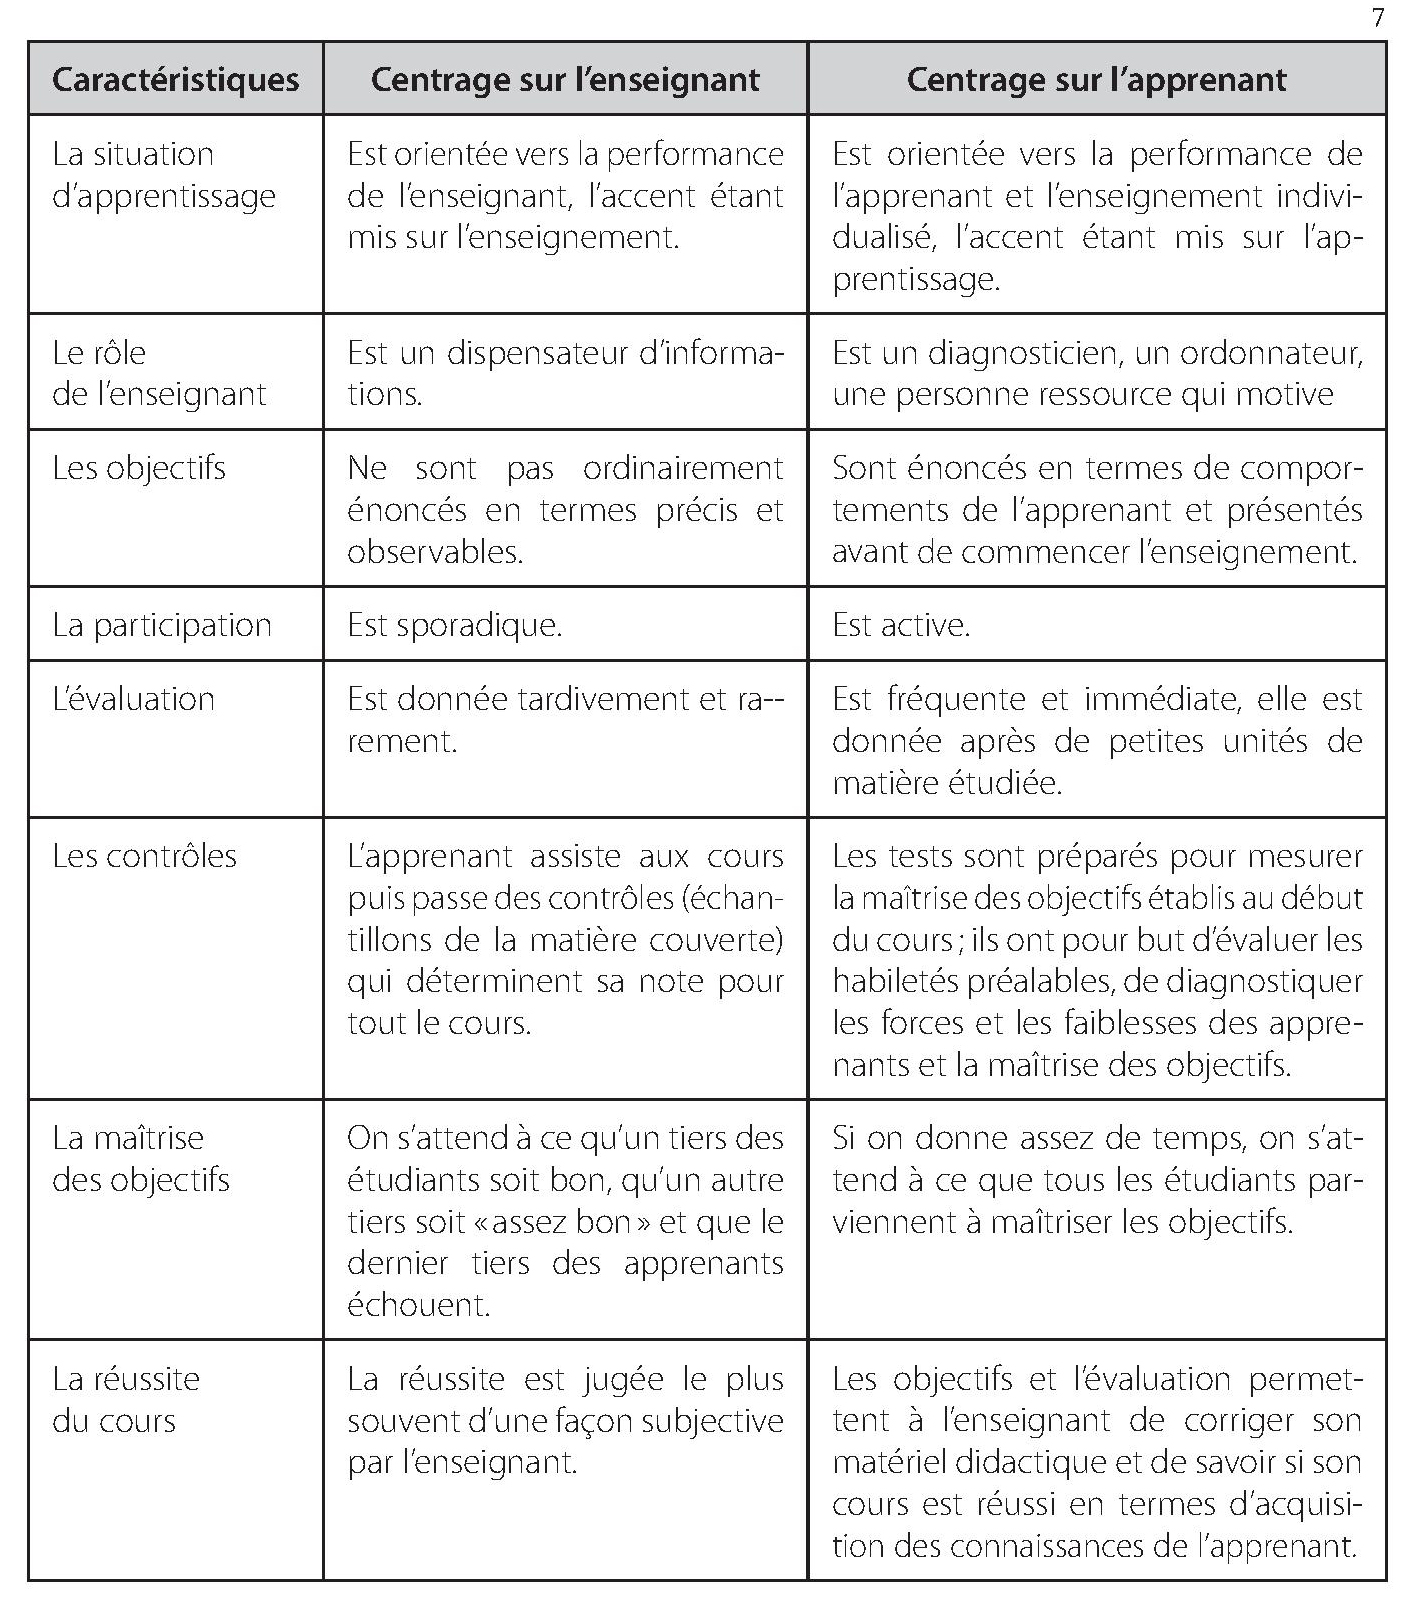 Dissertation consulting service juridique